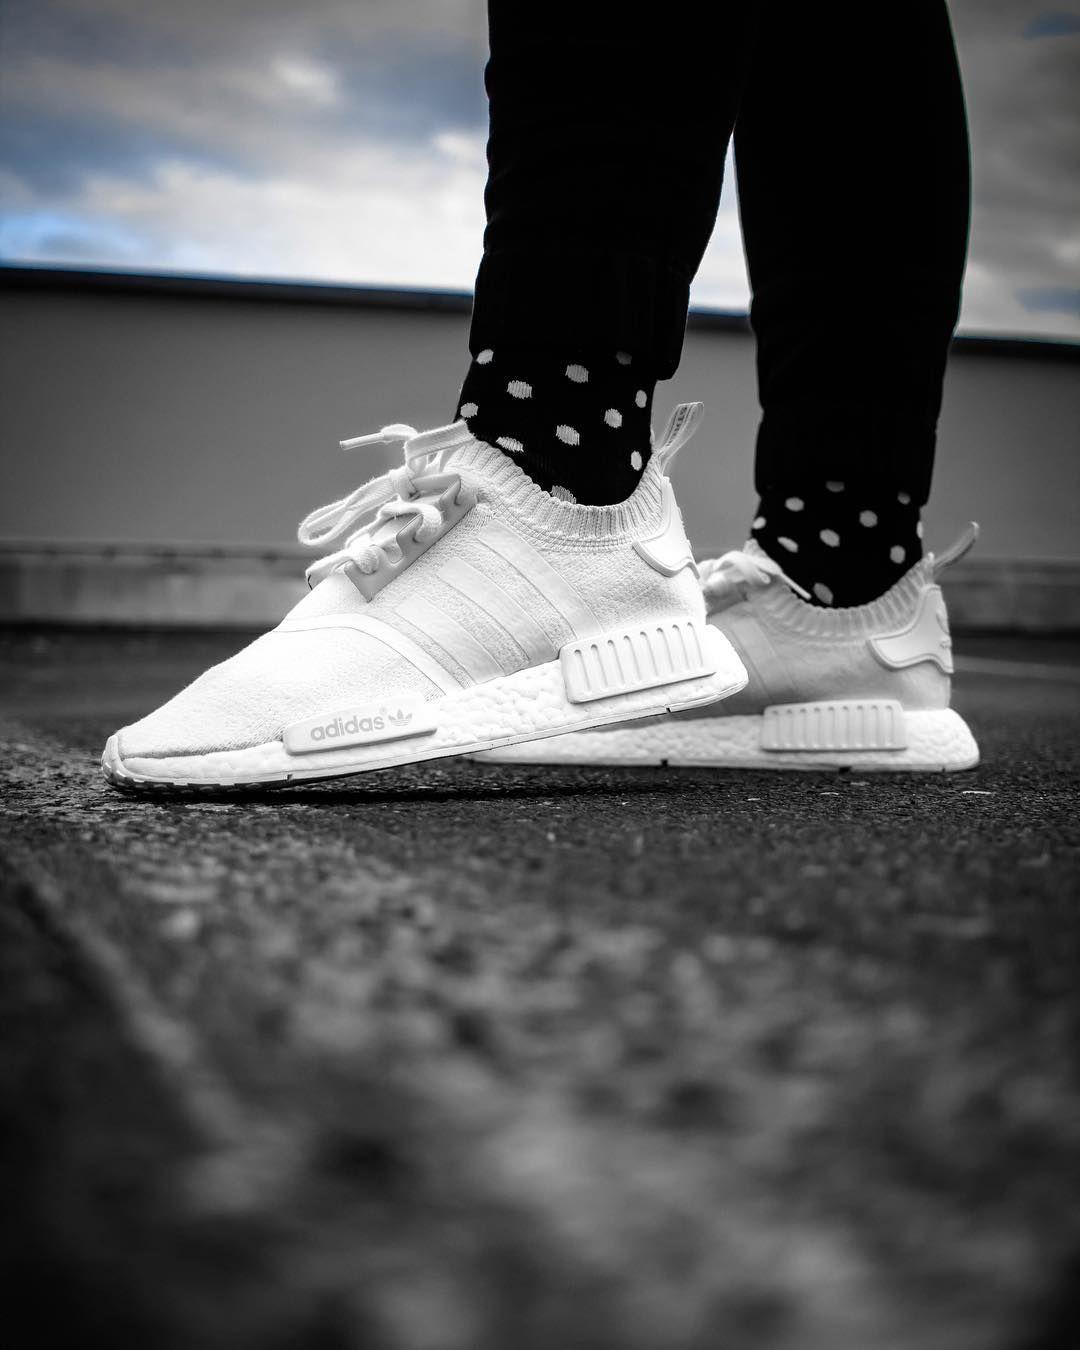 Adidas Nmd R1 Primeknit Triple White Sneakers Fashion Happy Socks Winter Outfits